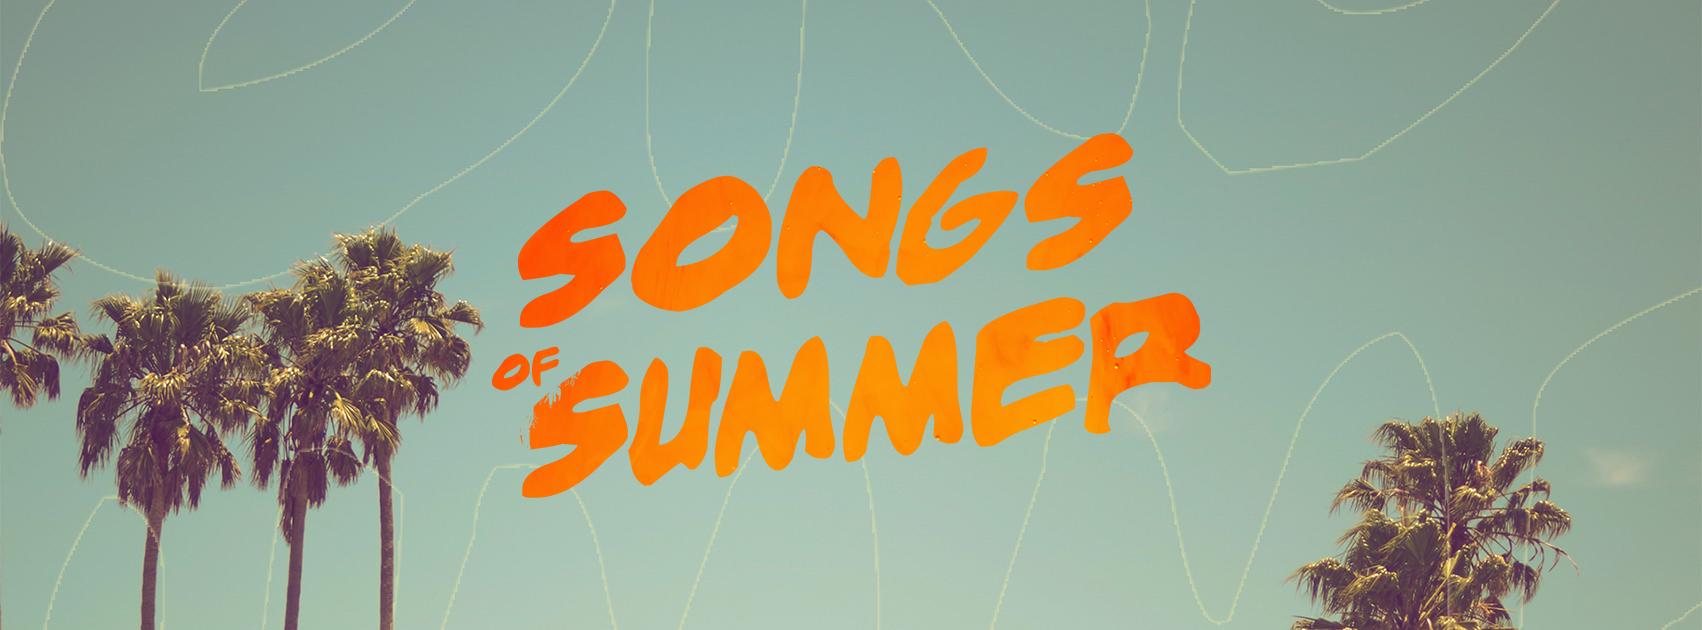 Songs of Summer FB Cover Photo.jpg